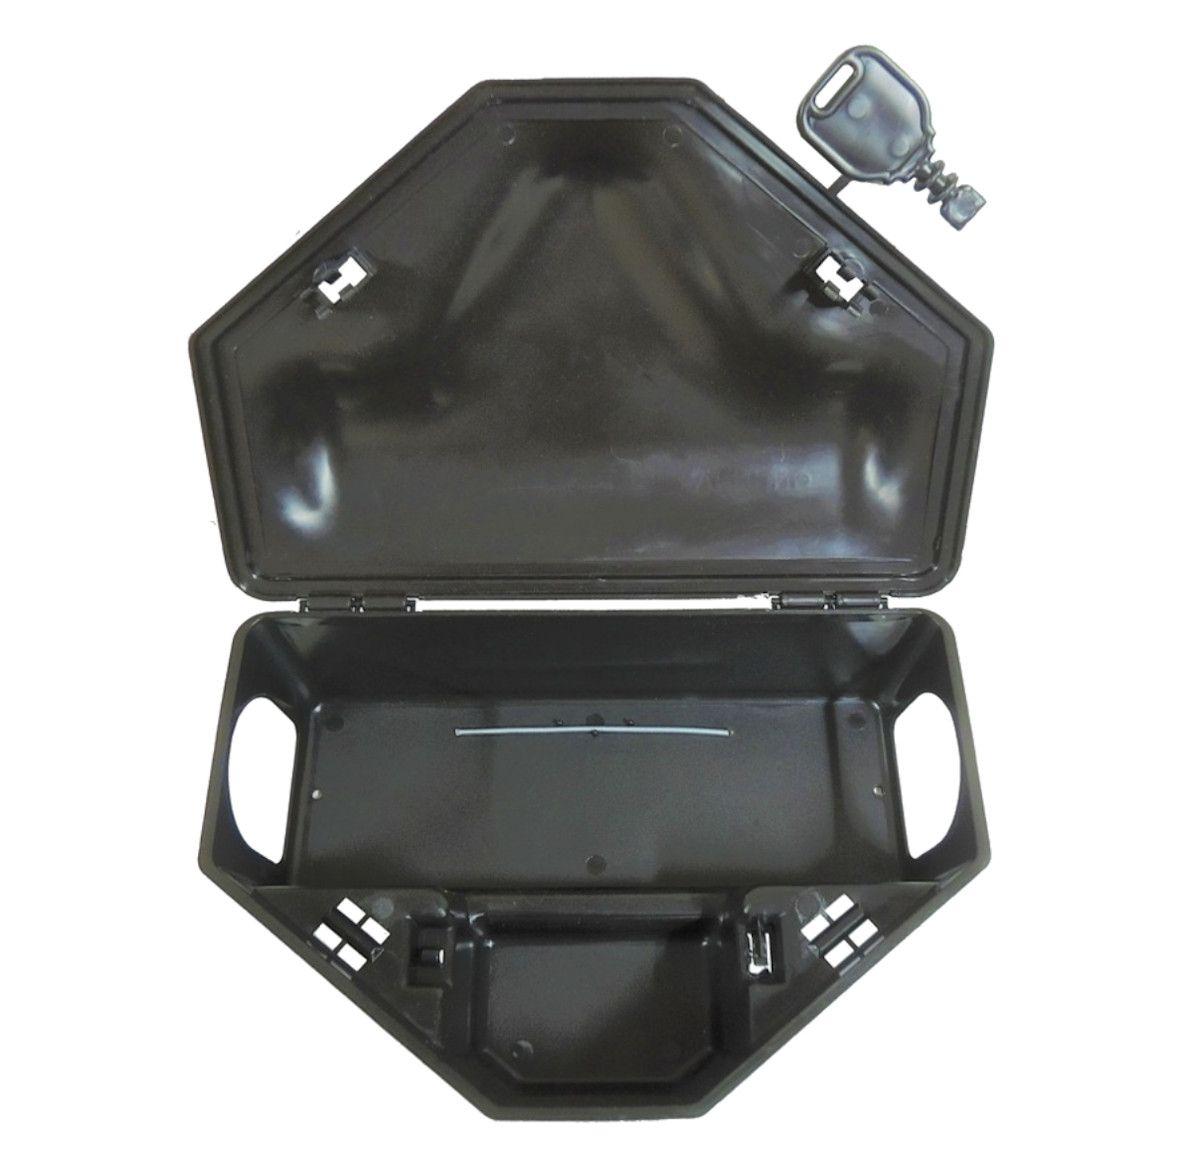 Kit 50 Porta Isca C/2 Chaves + 50 Bloco Extrusado Mata Seca